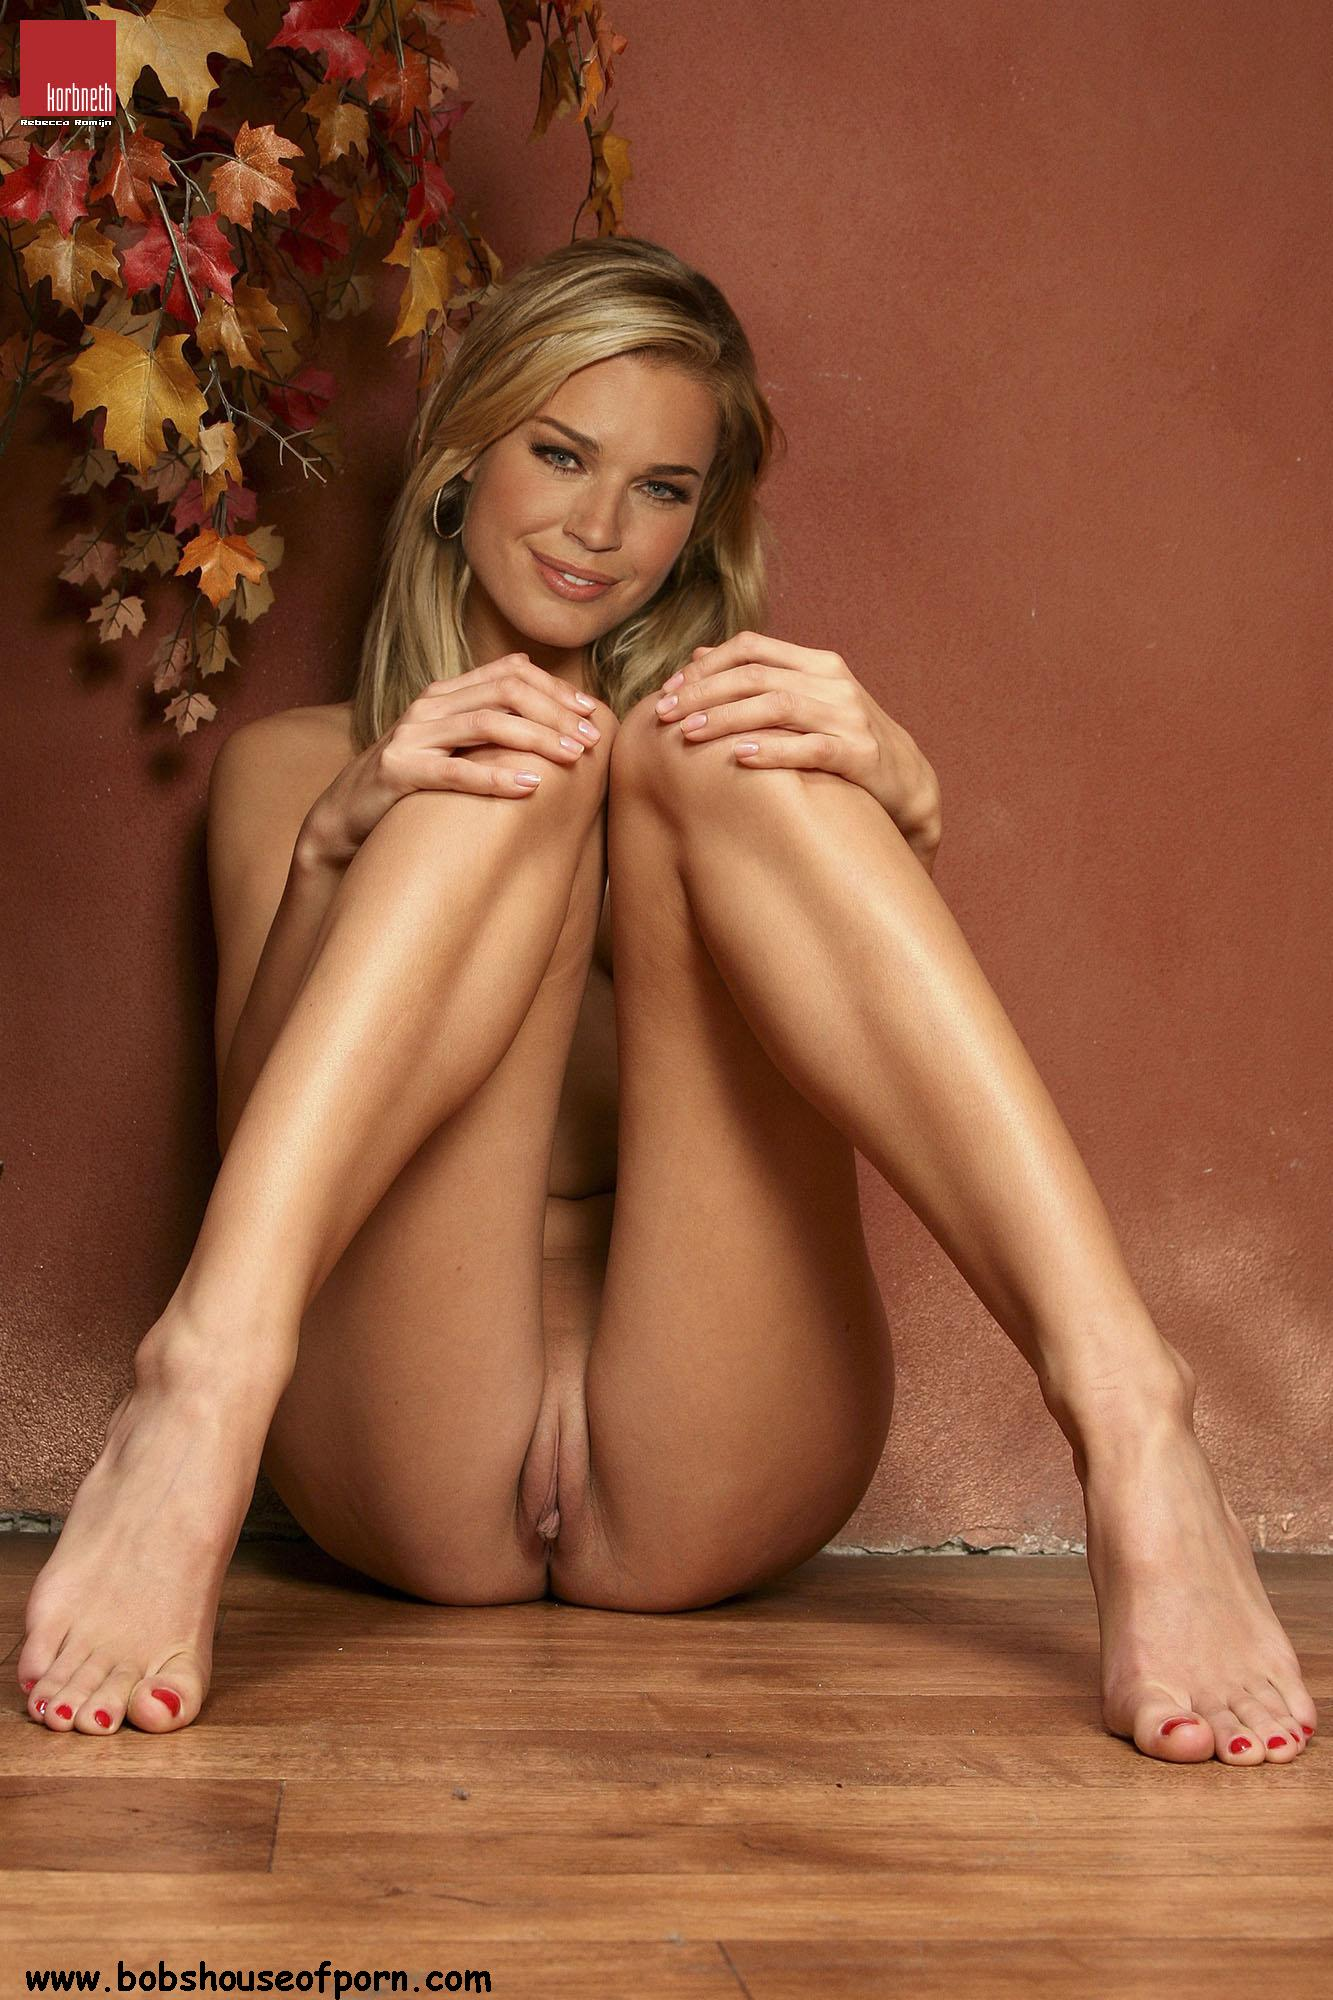 rebecca romijn stamos hottest nude pics